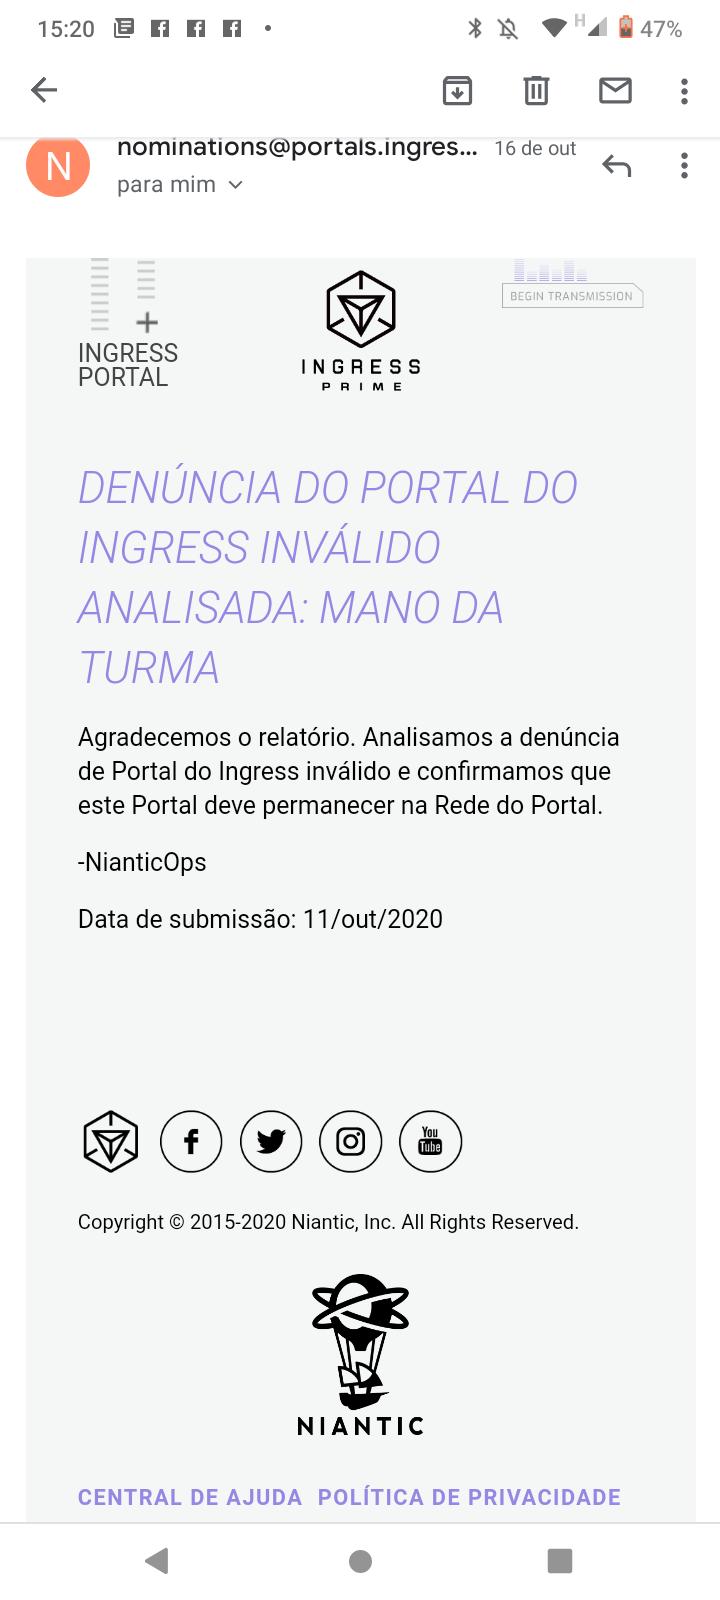 Screenshot_20201205-152025.png